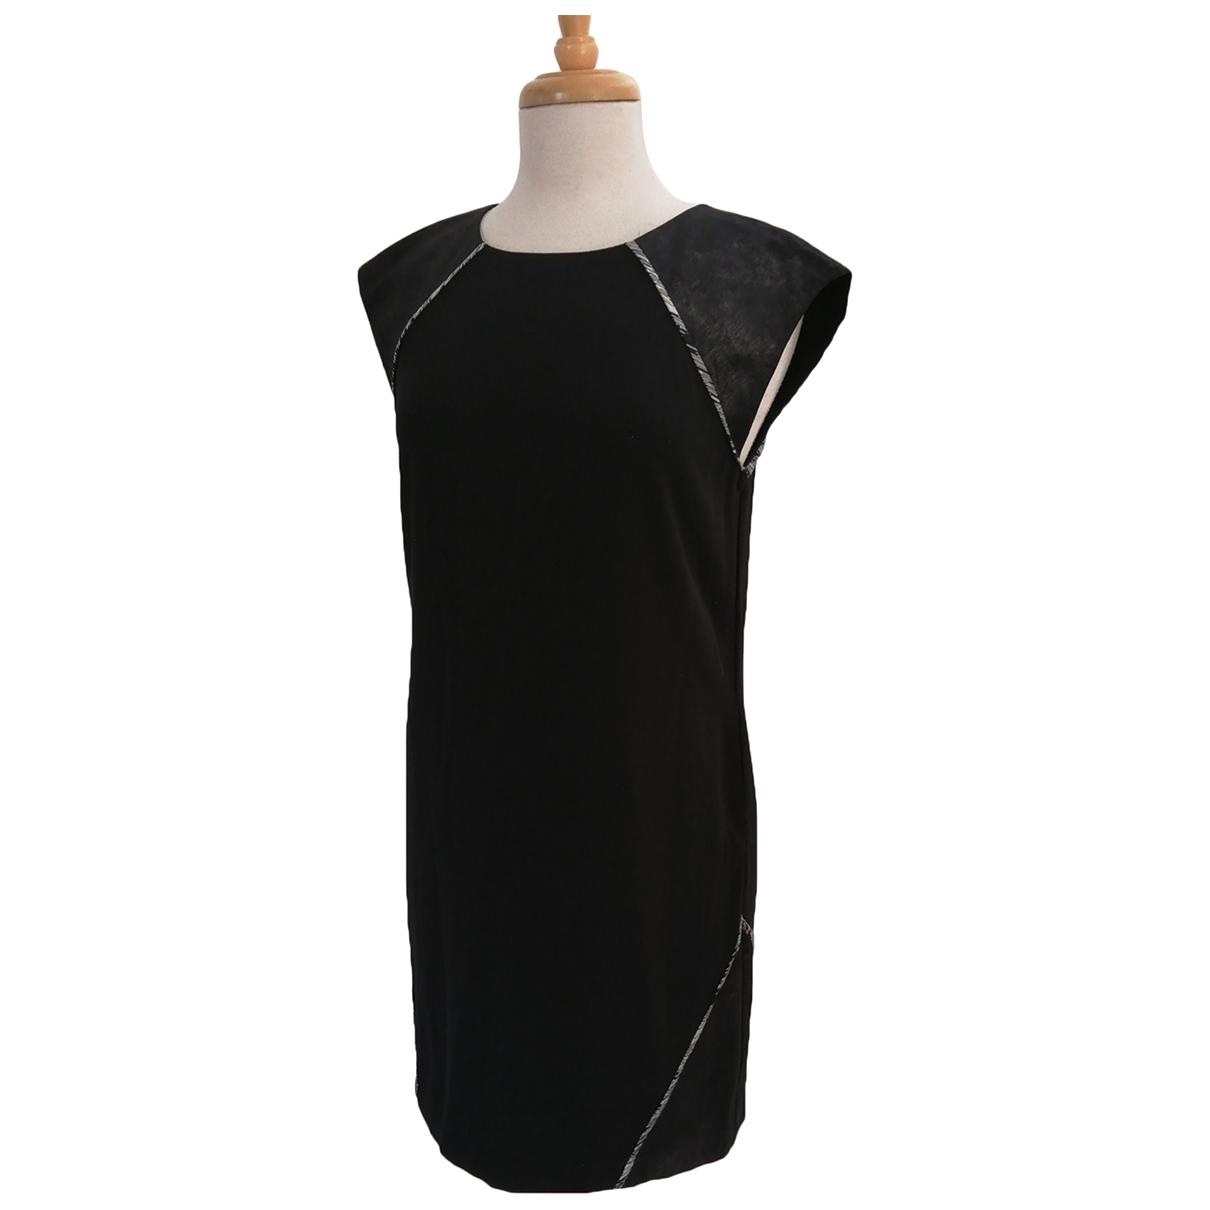 Catherine Malandrino \N Kleid in  Schwarz Polyester